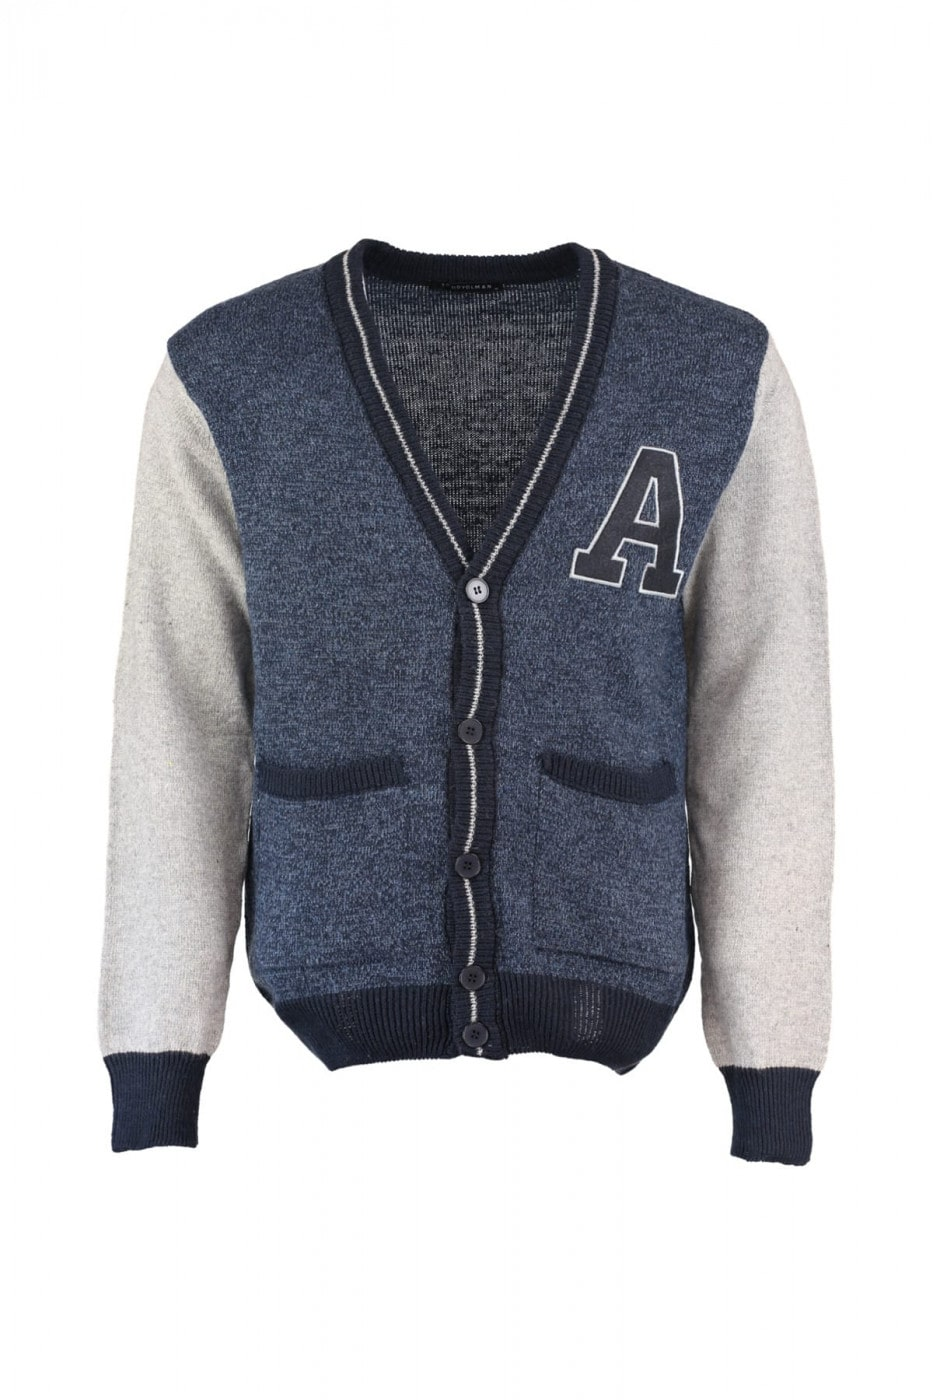 Trendyol Navy Blue Men's Pocket Edging Cardigan